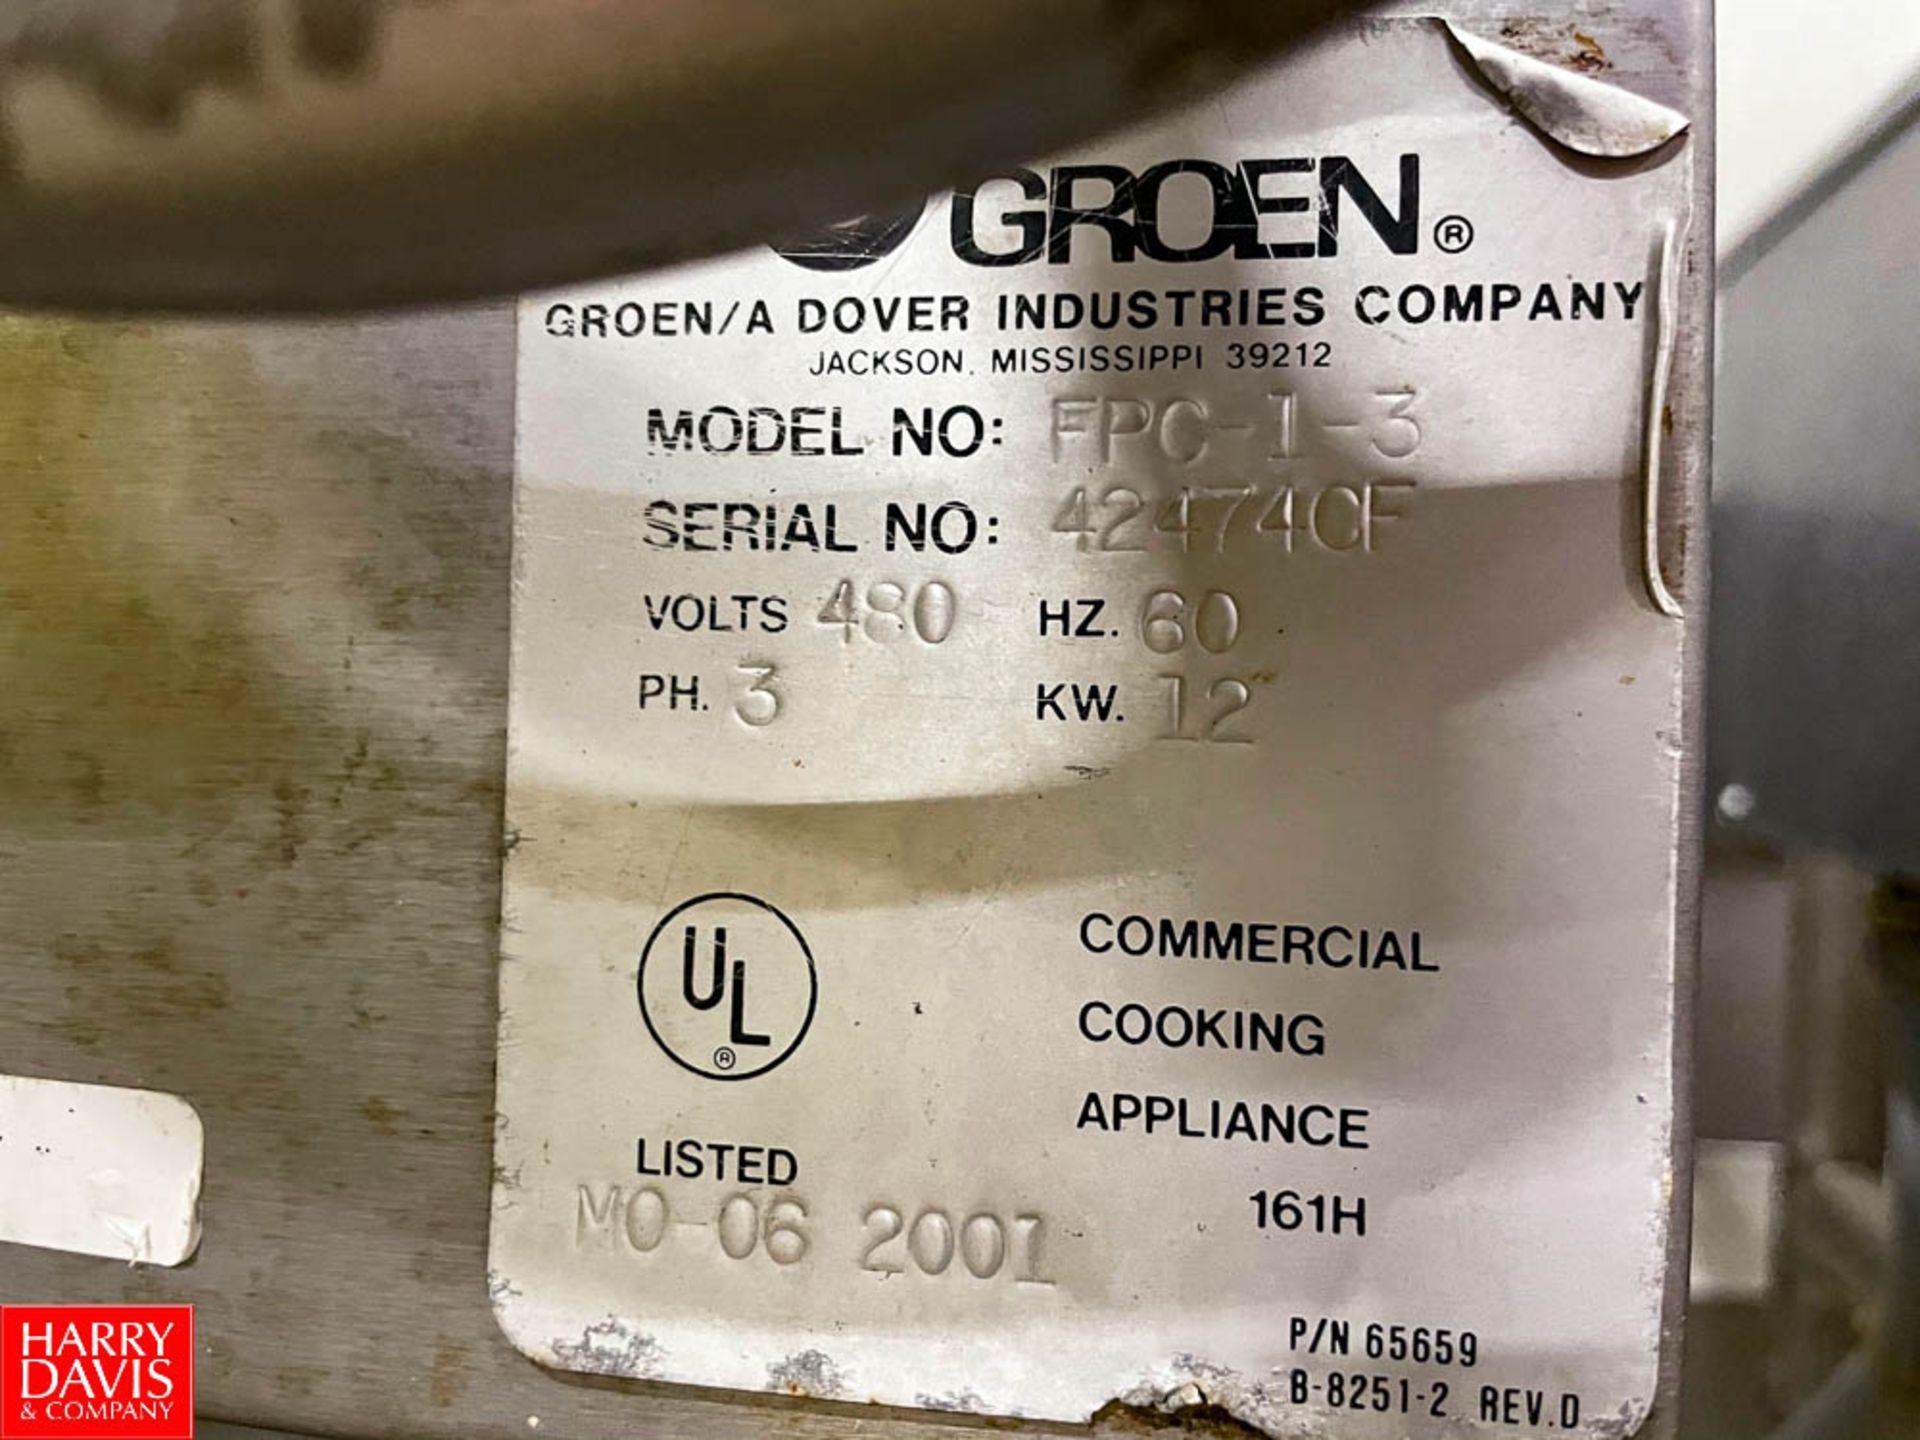 Groen 30 Gallon S/S Electric Tilt Skillet. Rigging Fee: $325 - Image 3 of 3